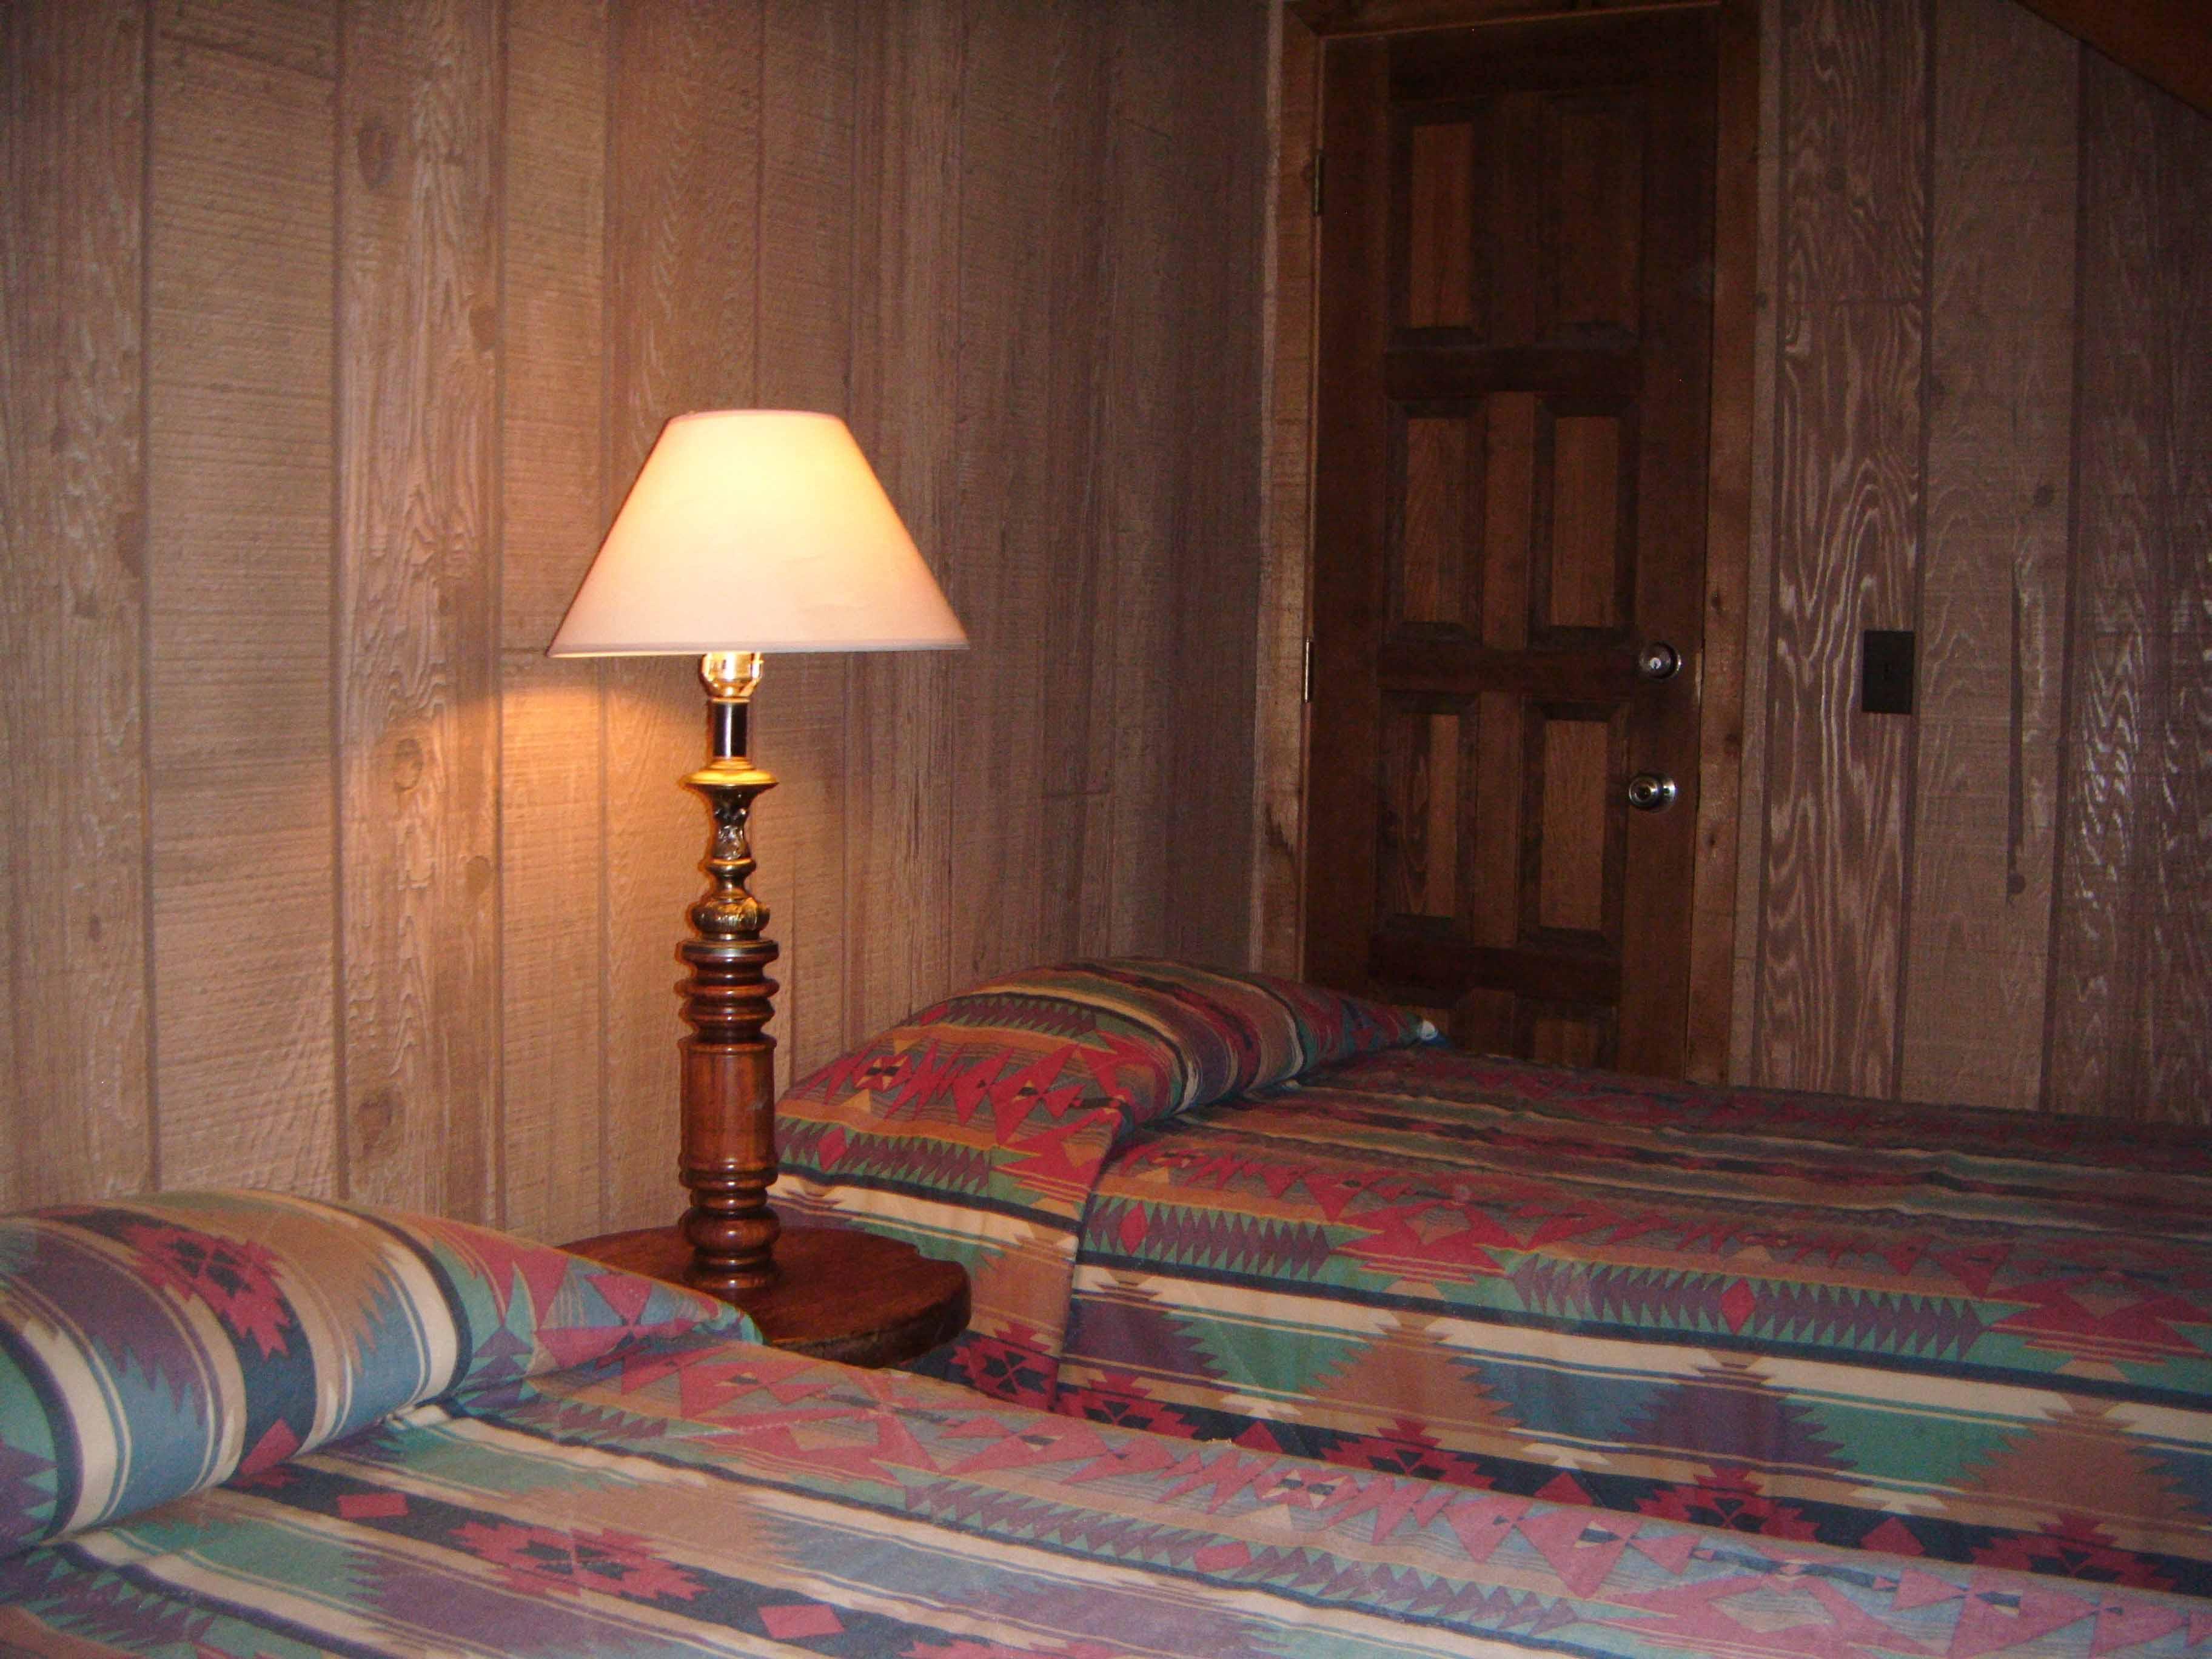 Winter Park Vacation Rental Lodge